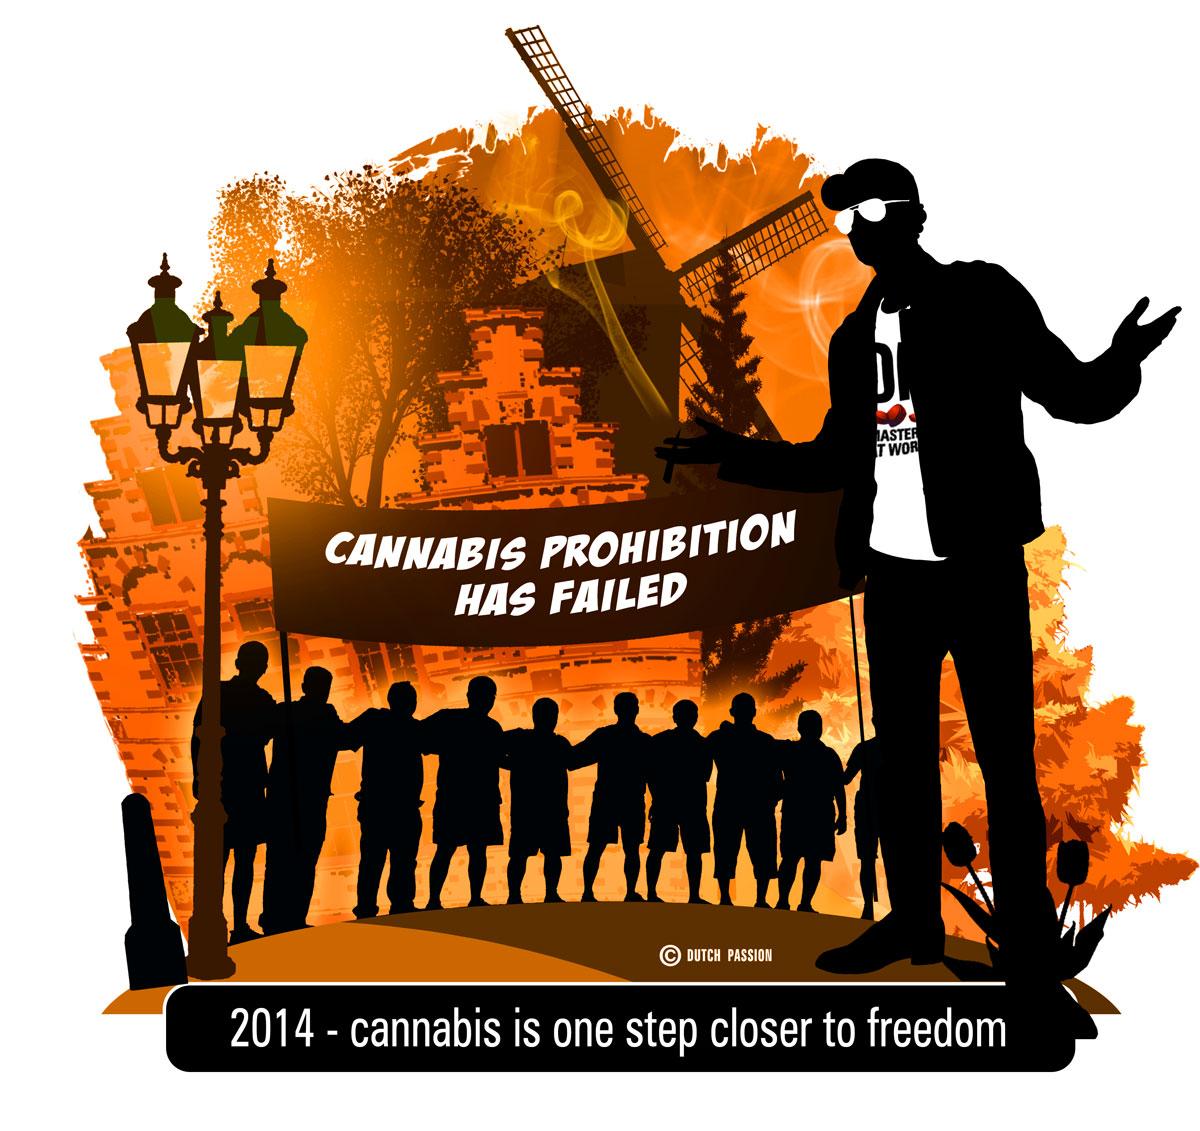 prohibition has failed